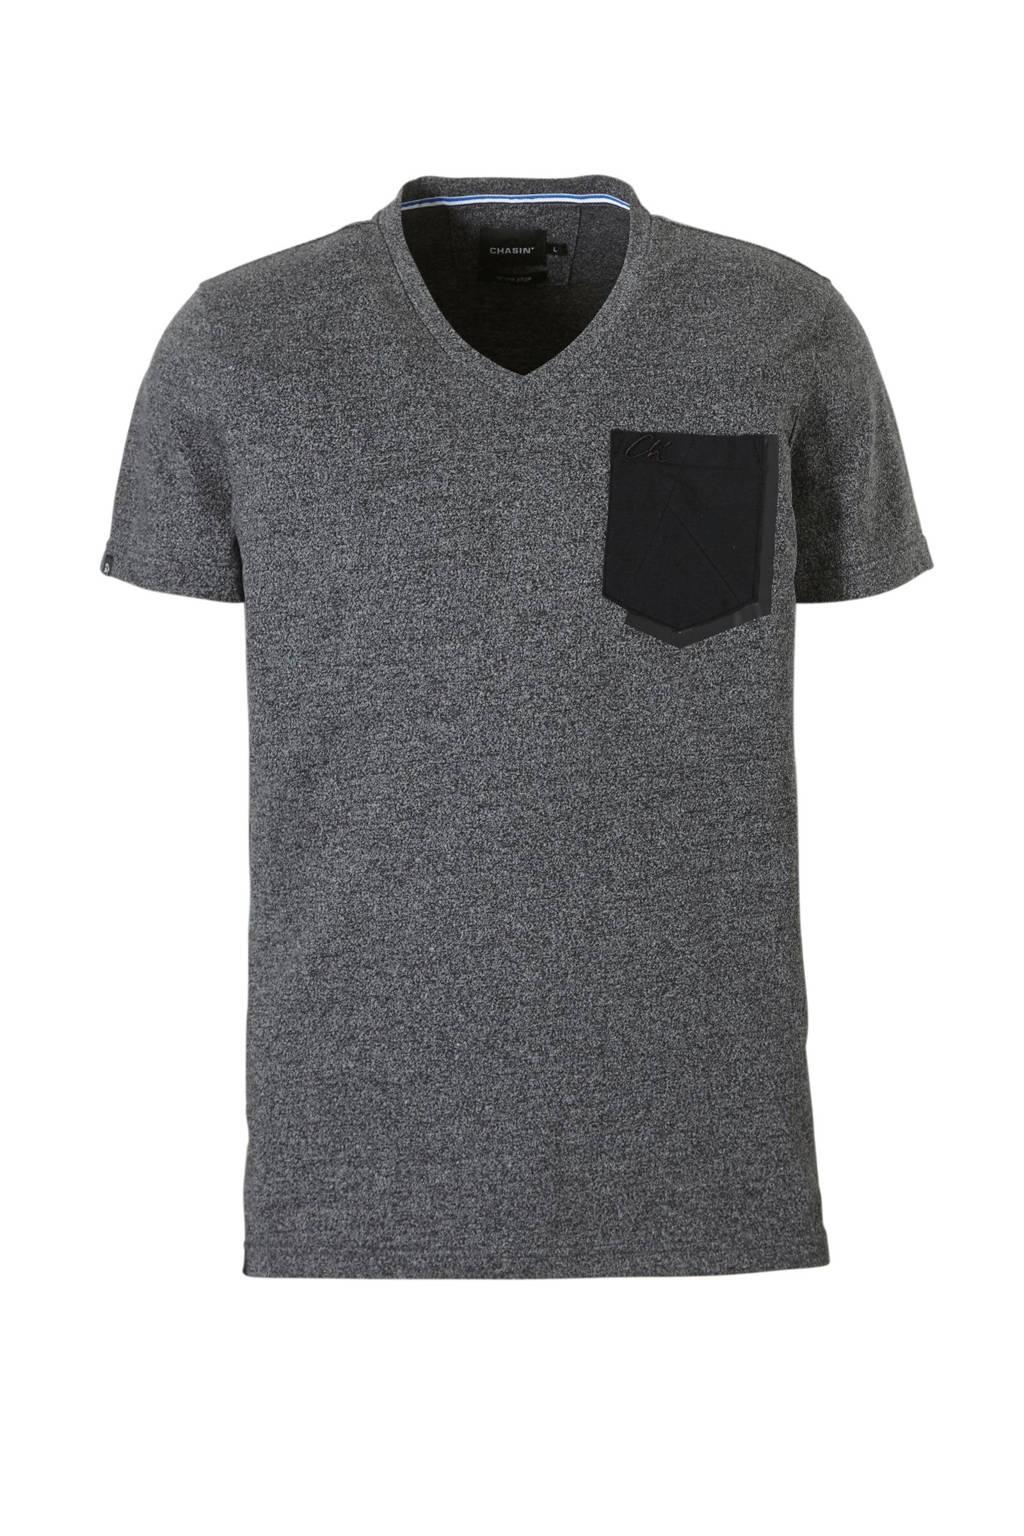 Chasin' T-shirt, Grijs melange